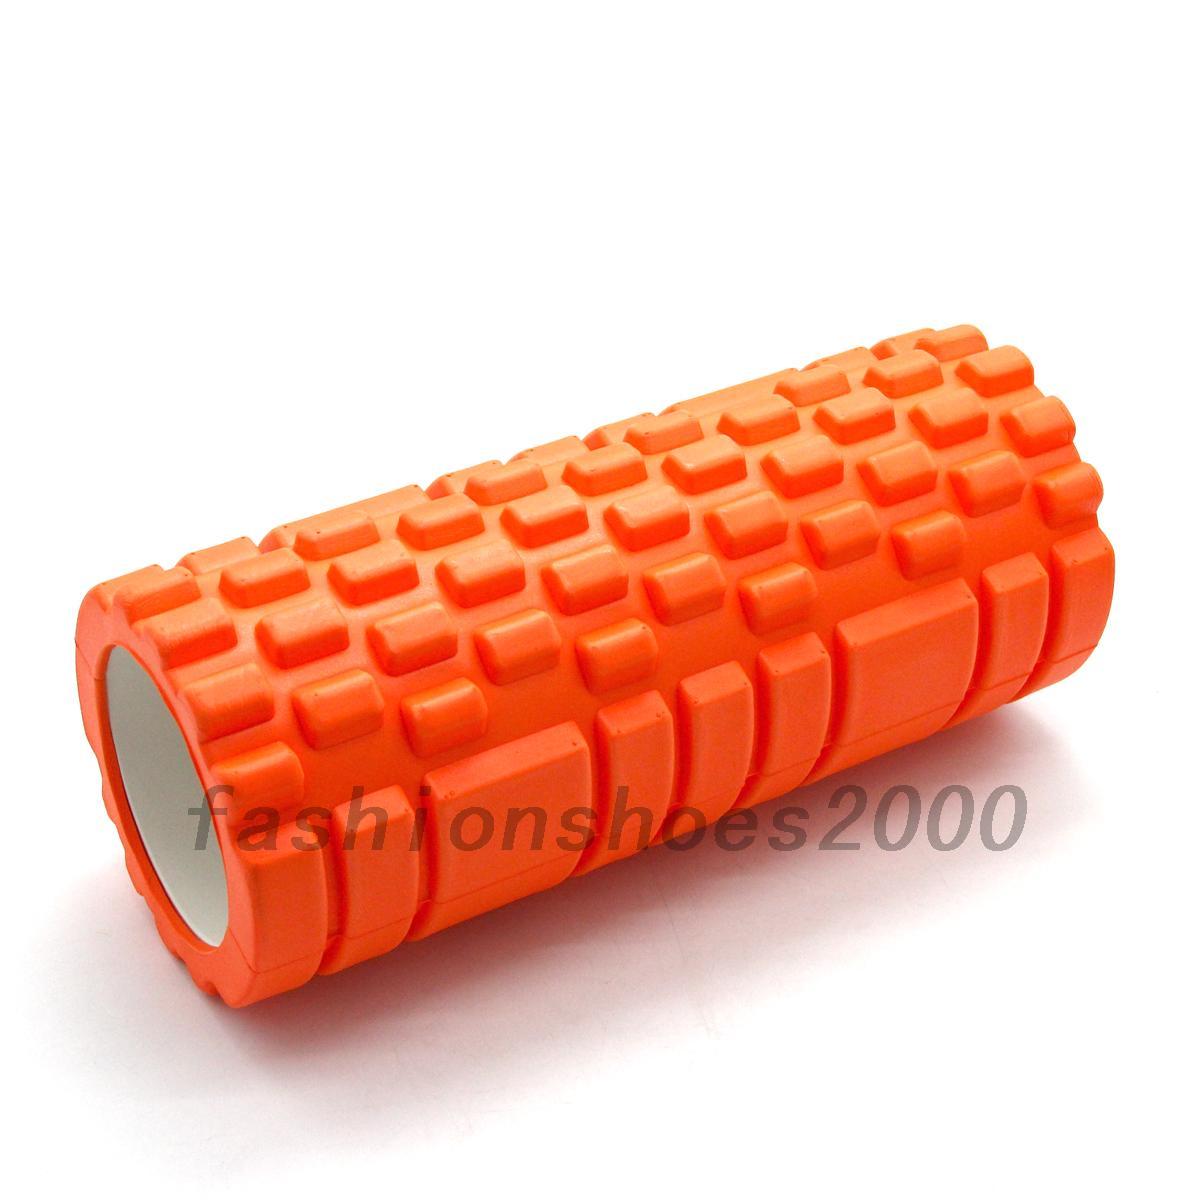 fitness yoga sport rollen foamroller foam roller schaumstoffrolle massagerolle ebay. Black Bedroom Furniture Sets. Home Design Ideas